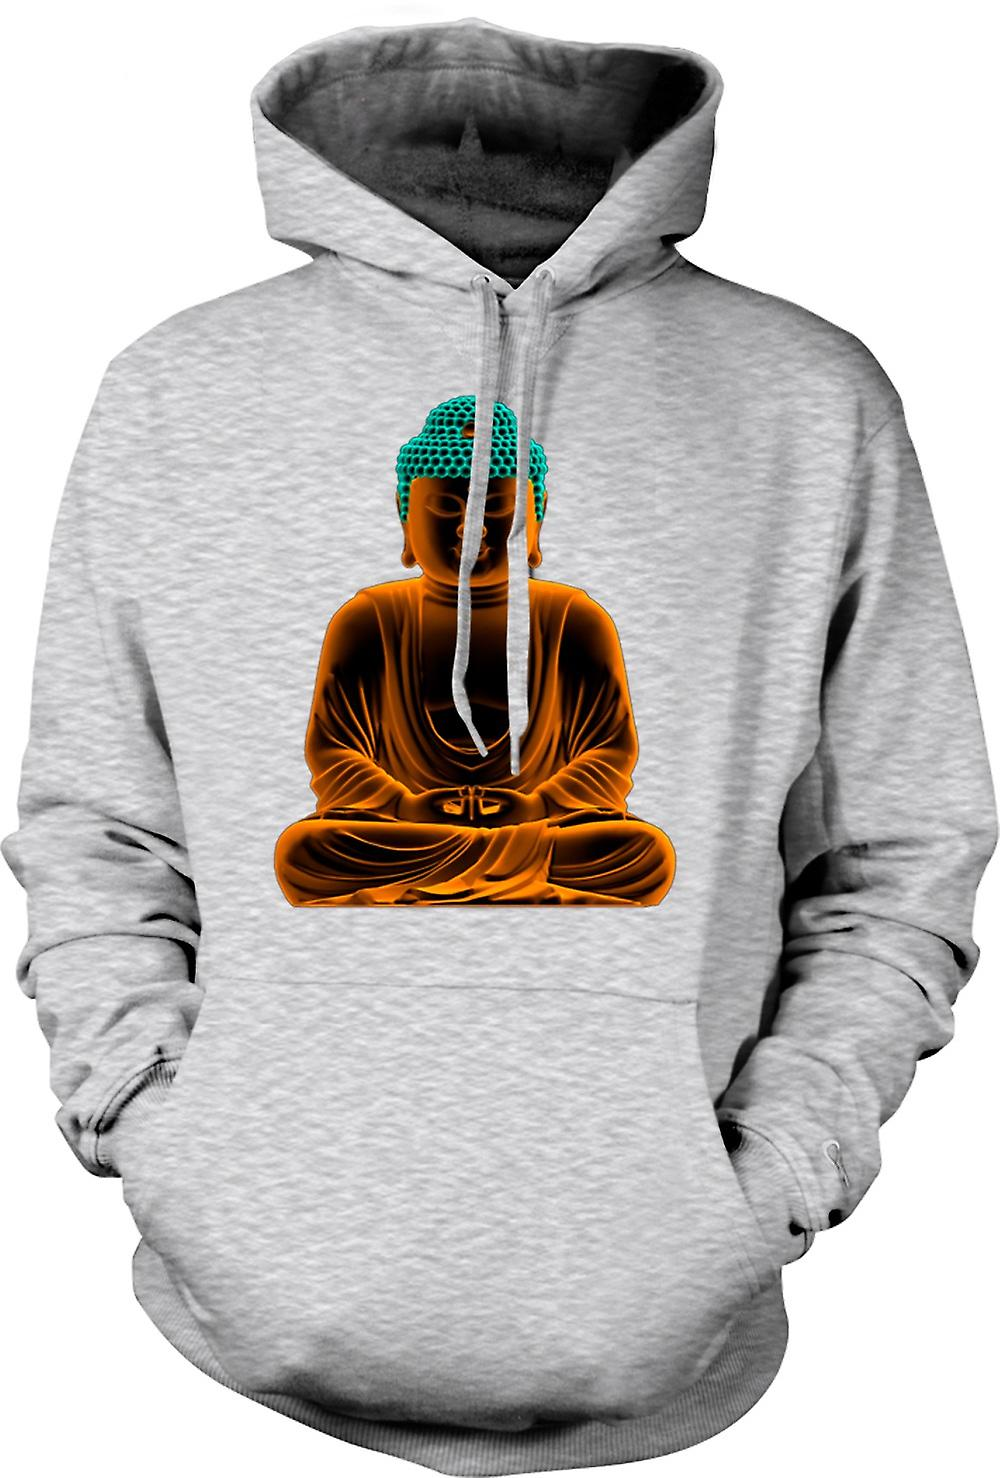 Mens Hoodie - sereno Buddha d'oro - spirituale